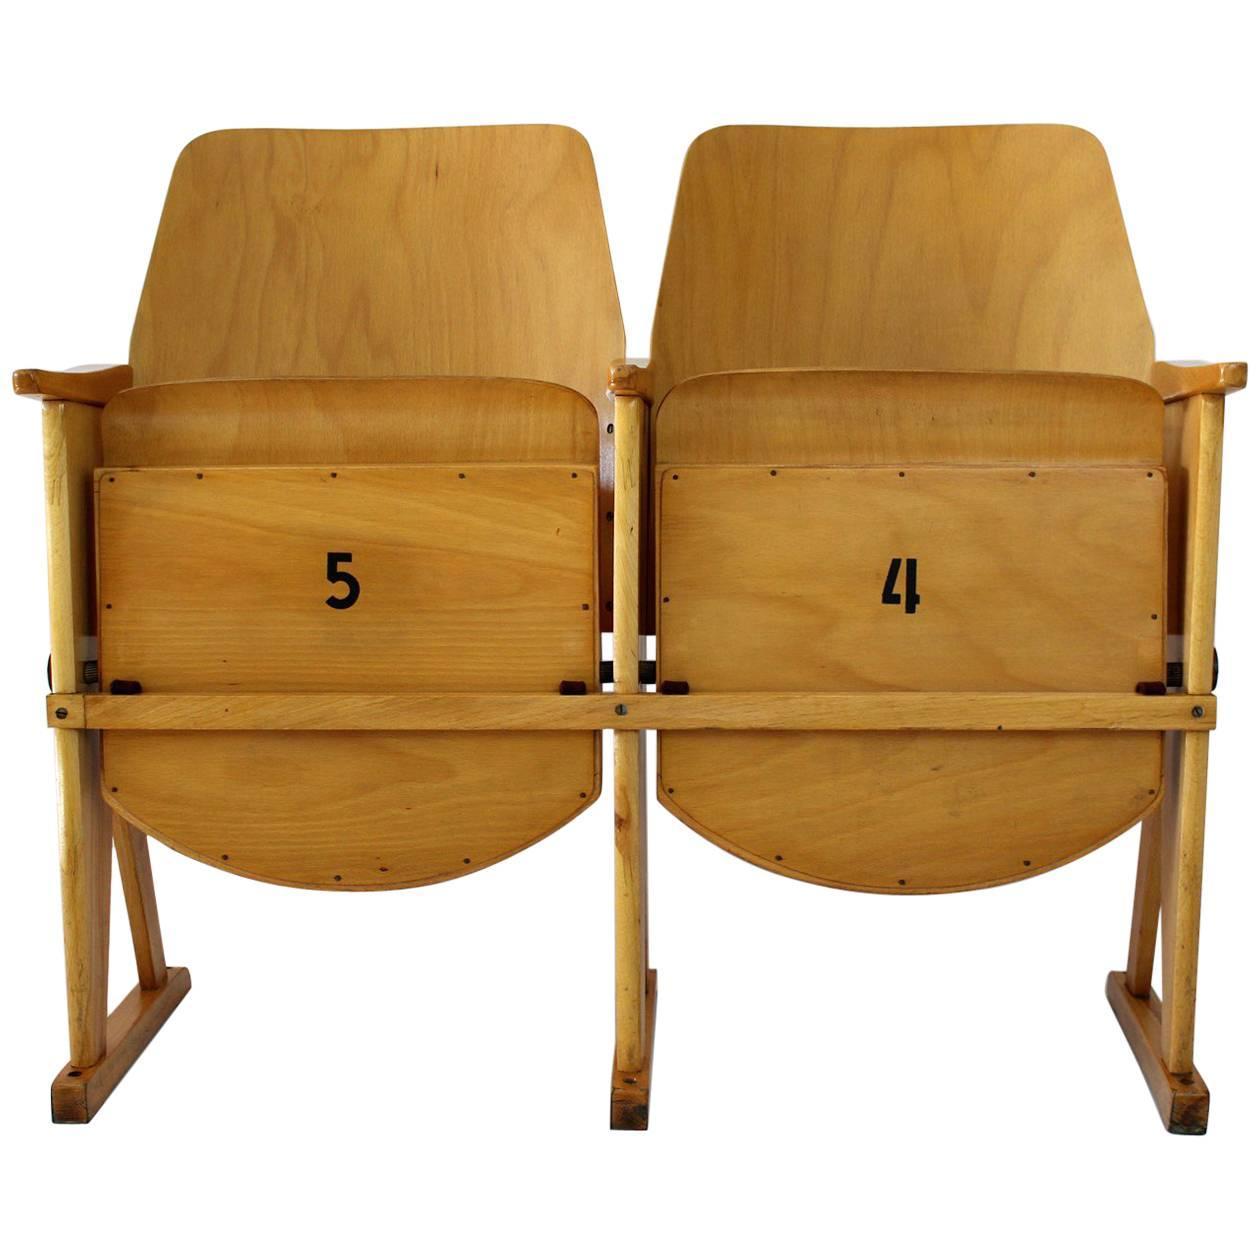 Perfect Vintage Cinema Chairs From TON U0027Thonetu0027, ...